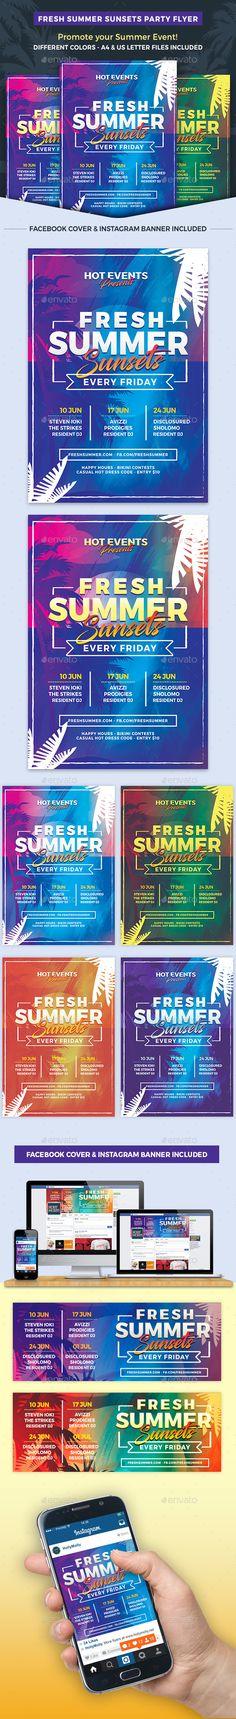 Fresh Summer Events Flyer Template PSD. Download here: https://graphicriver.net/item/fresh-summer-events-flyer-template/17092180?ref=ksioks